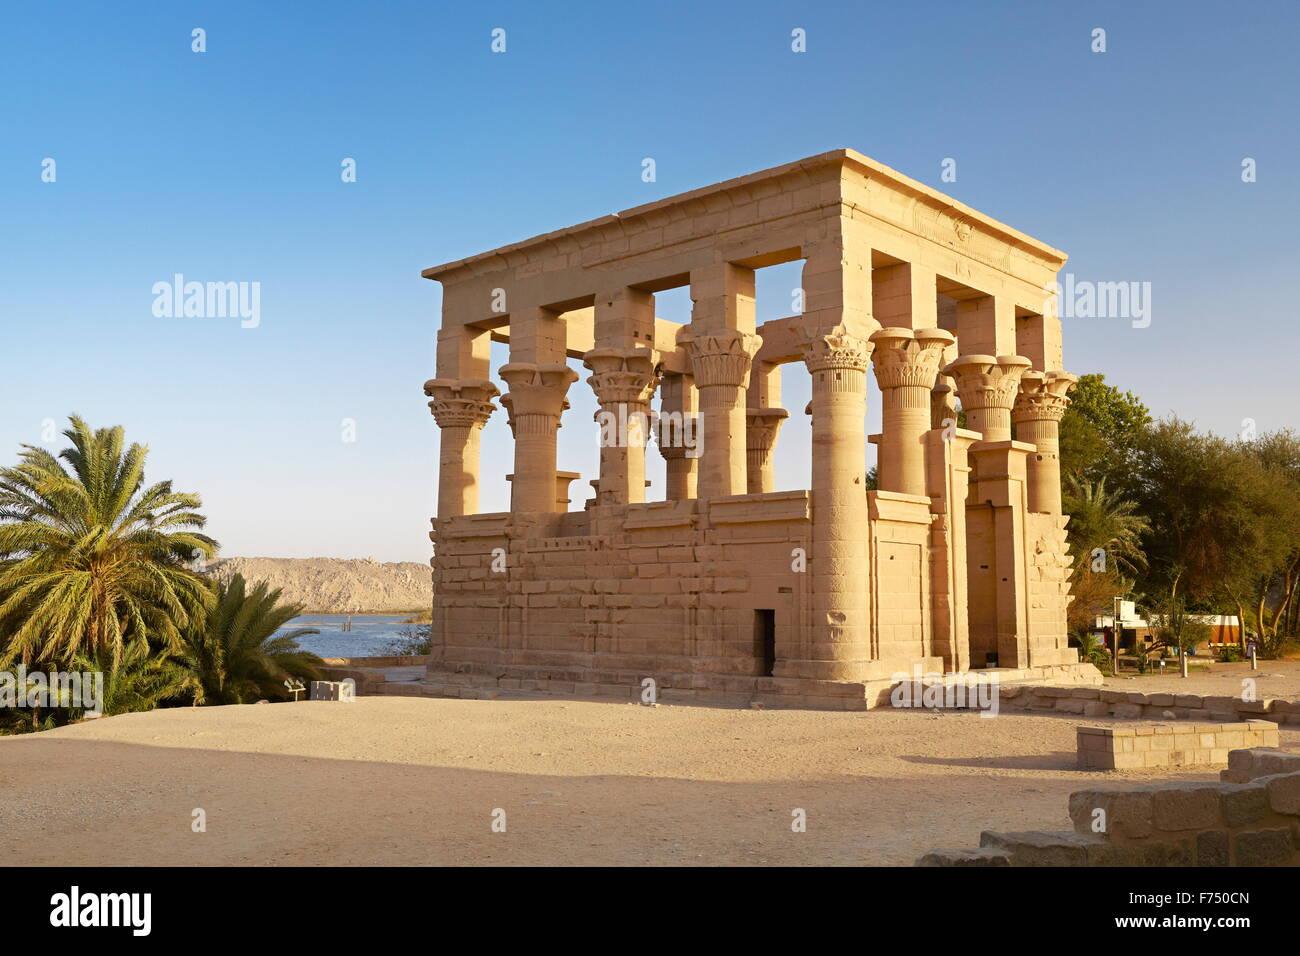 Egypt - Philae Island, Temple of Isis, UNESCO - Stock Image